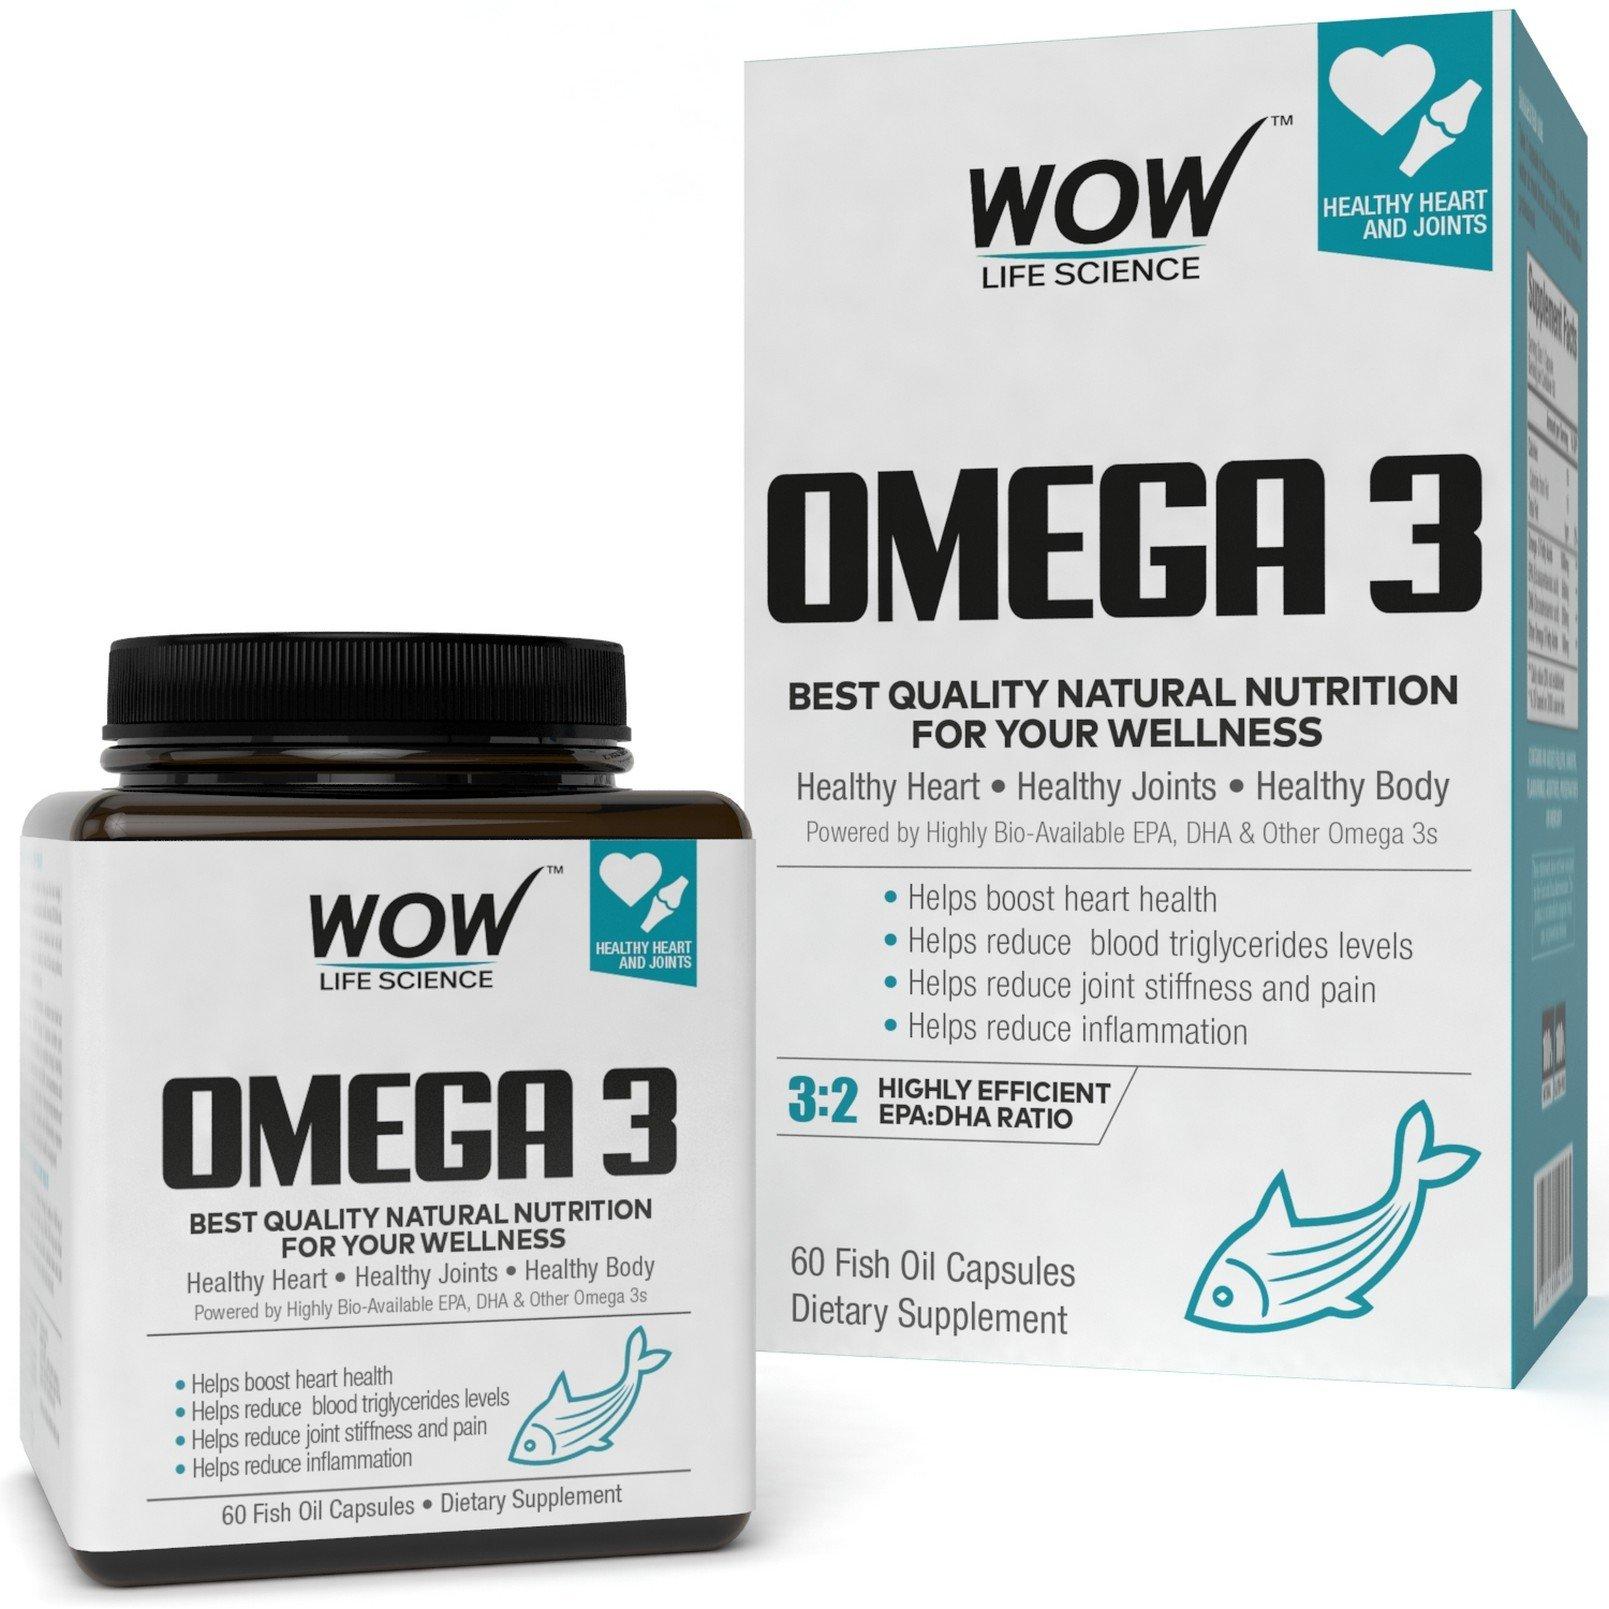 Wow Omega-3 Fish Oil 1000 mg Triple Strength 550 mg EPA 350 mg - 60 Capsules product image